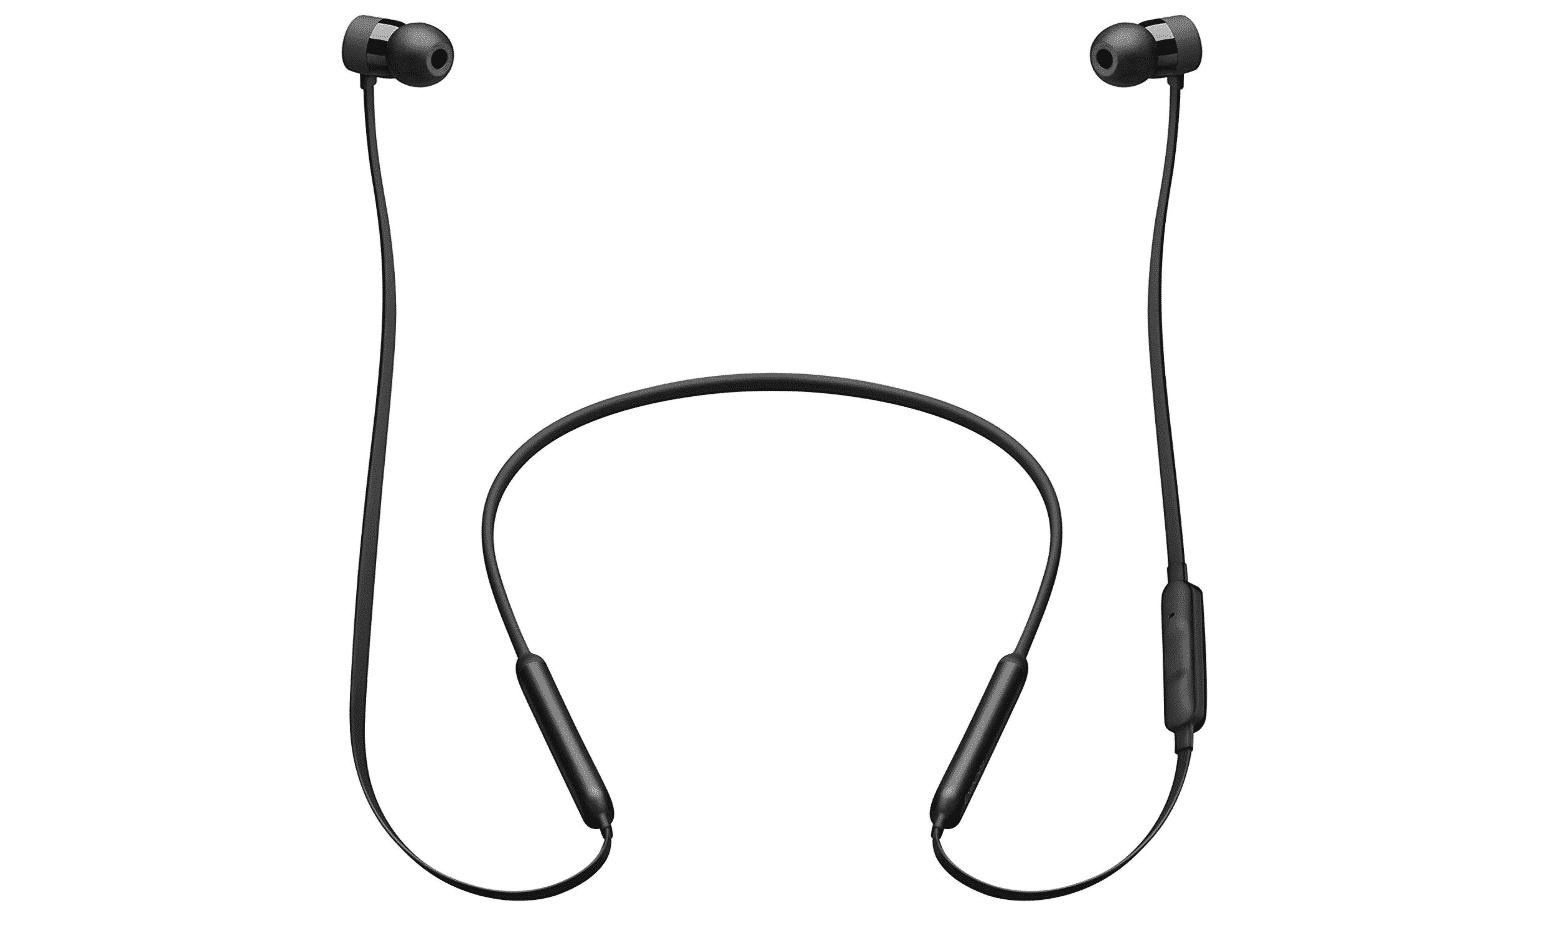 These are the BeatsX Wireless Earphones.